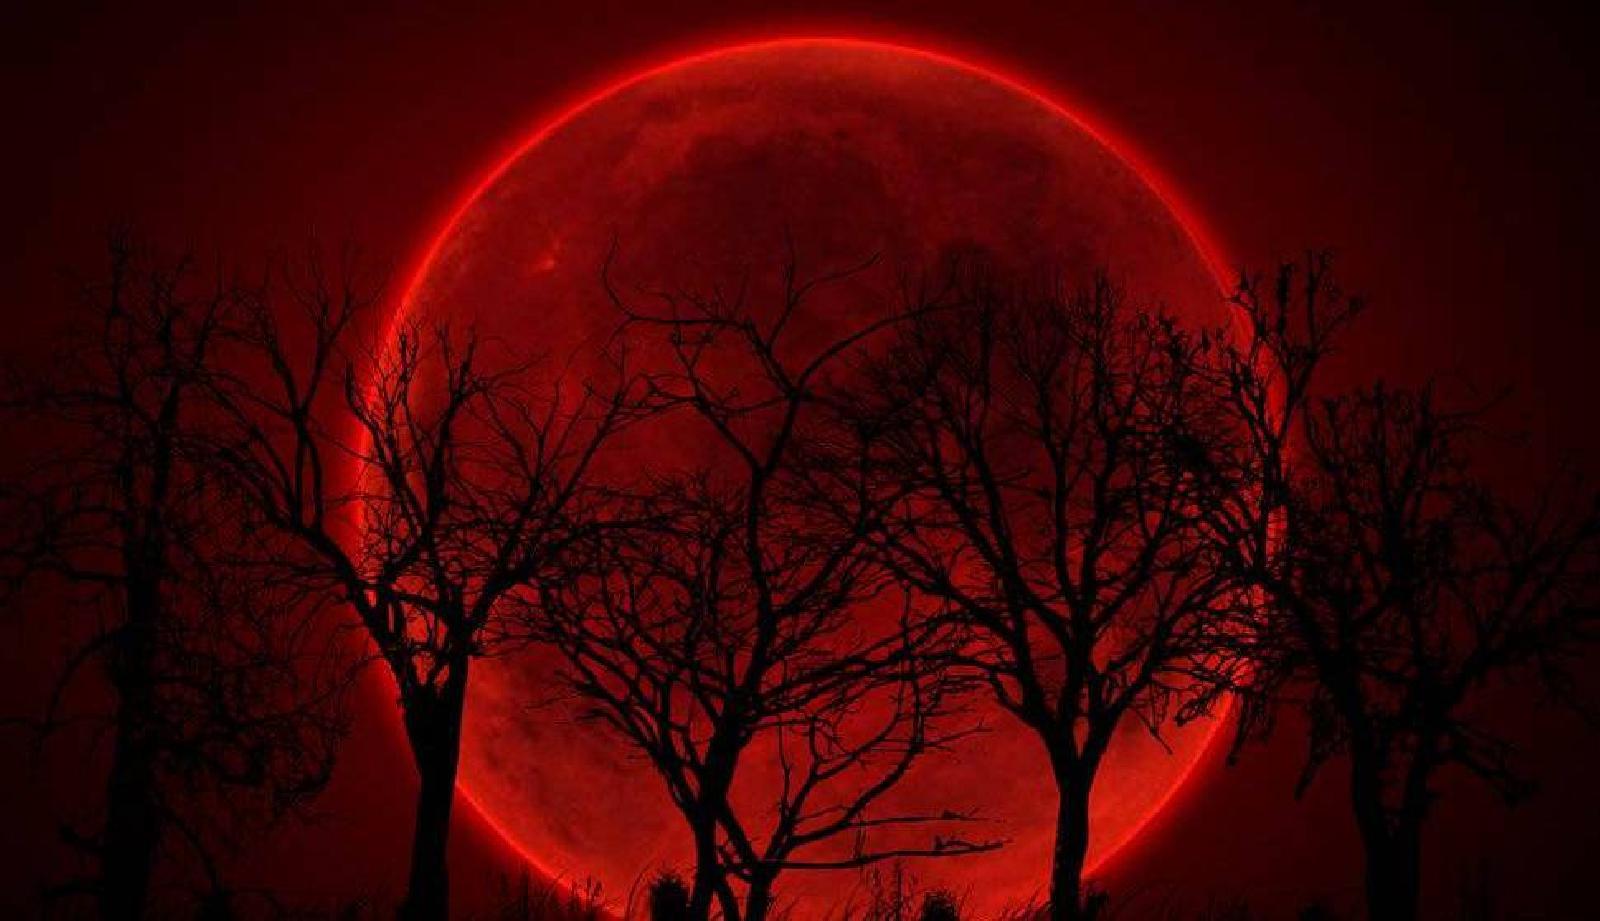 blood moon meaning virgo - photo #32